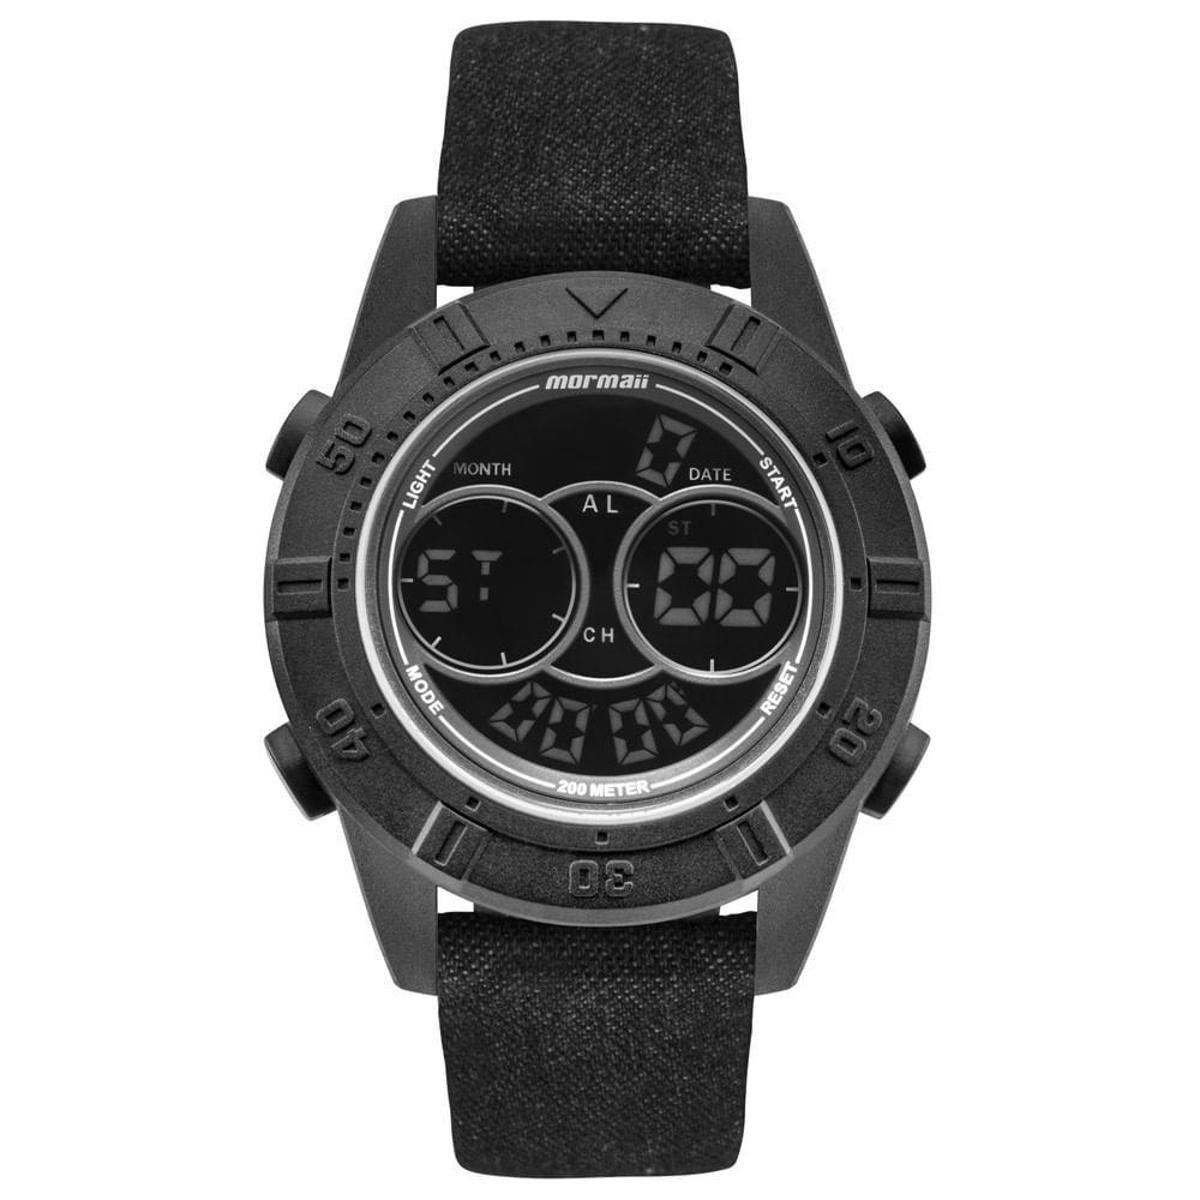 Relógio Mormaii Masculino Acqua Action - MO150915AH 2P MO150915AH 2P ... bdc95d0b91